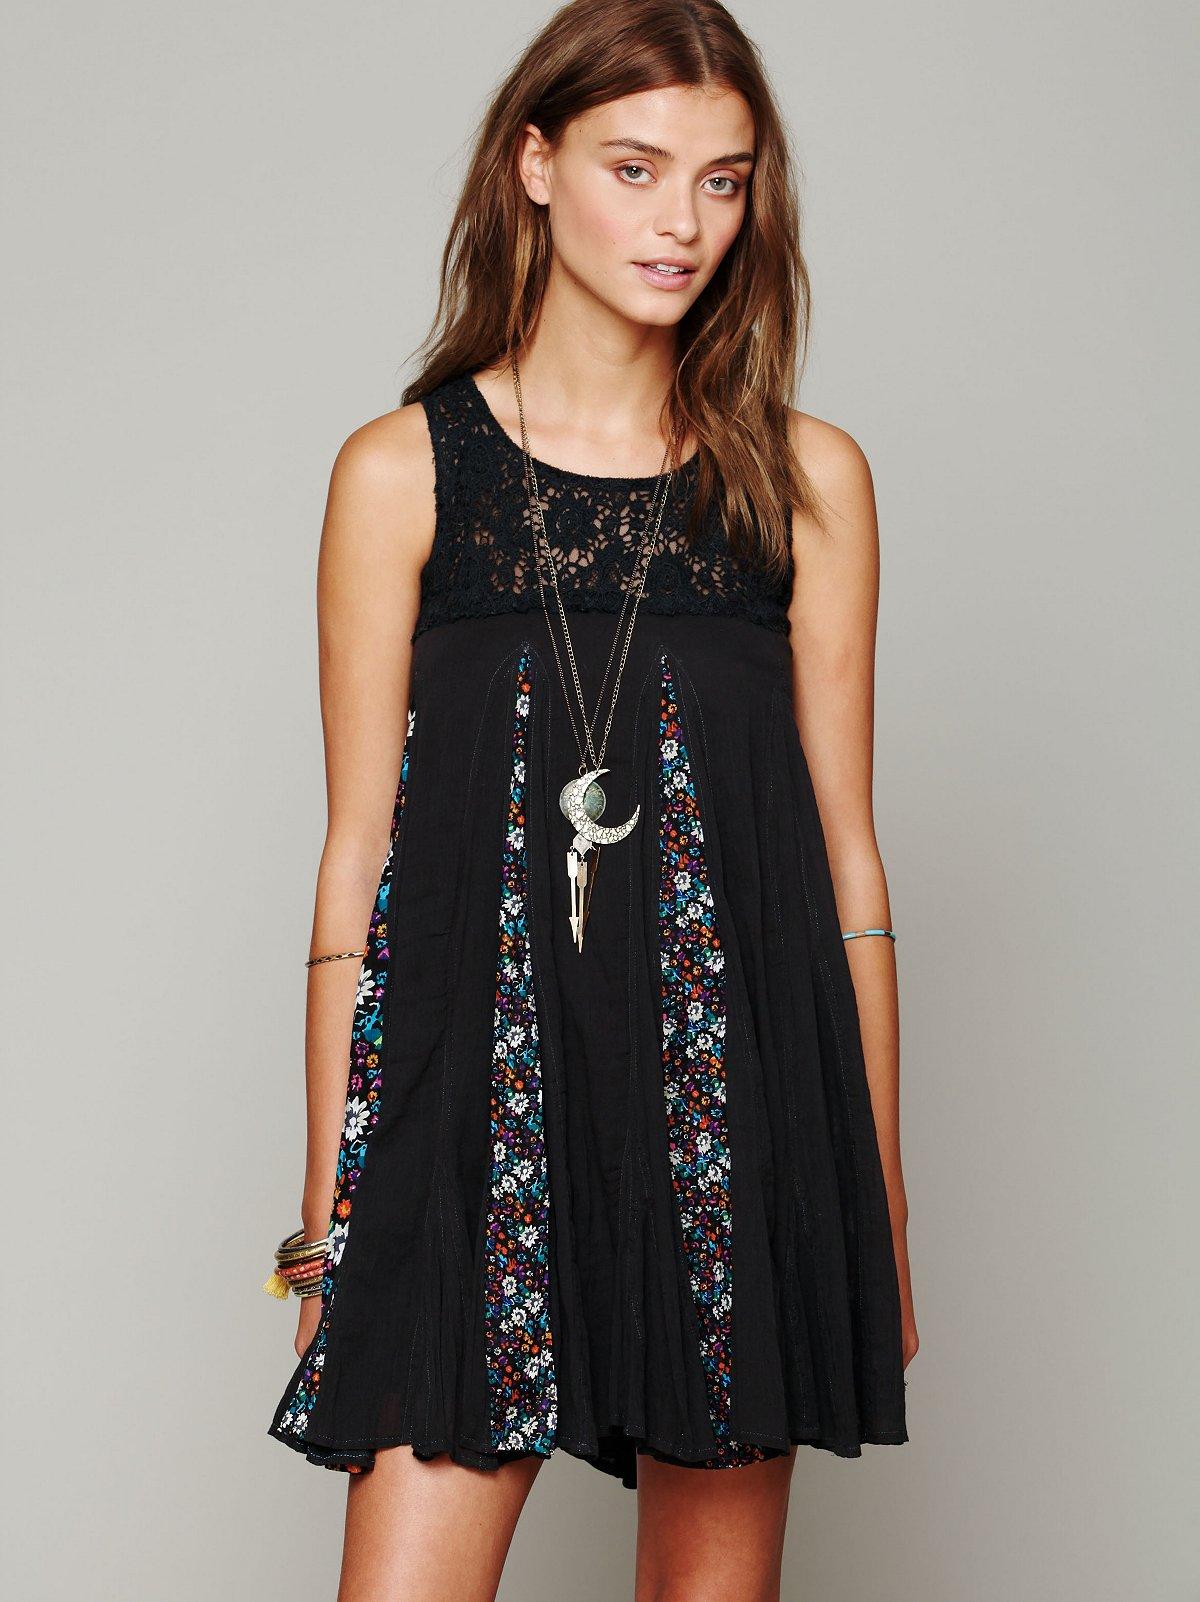 FP ONE Annabella Day Dress